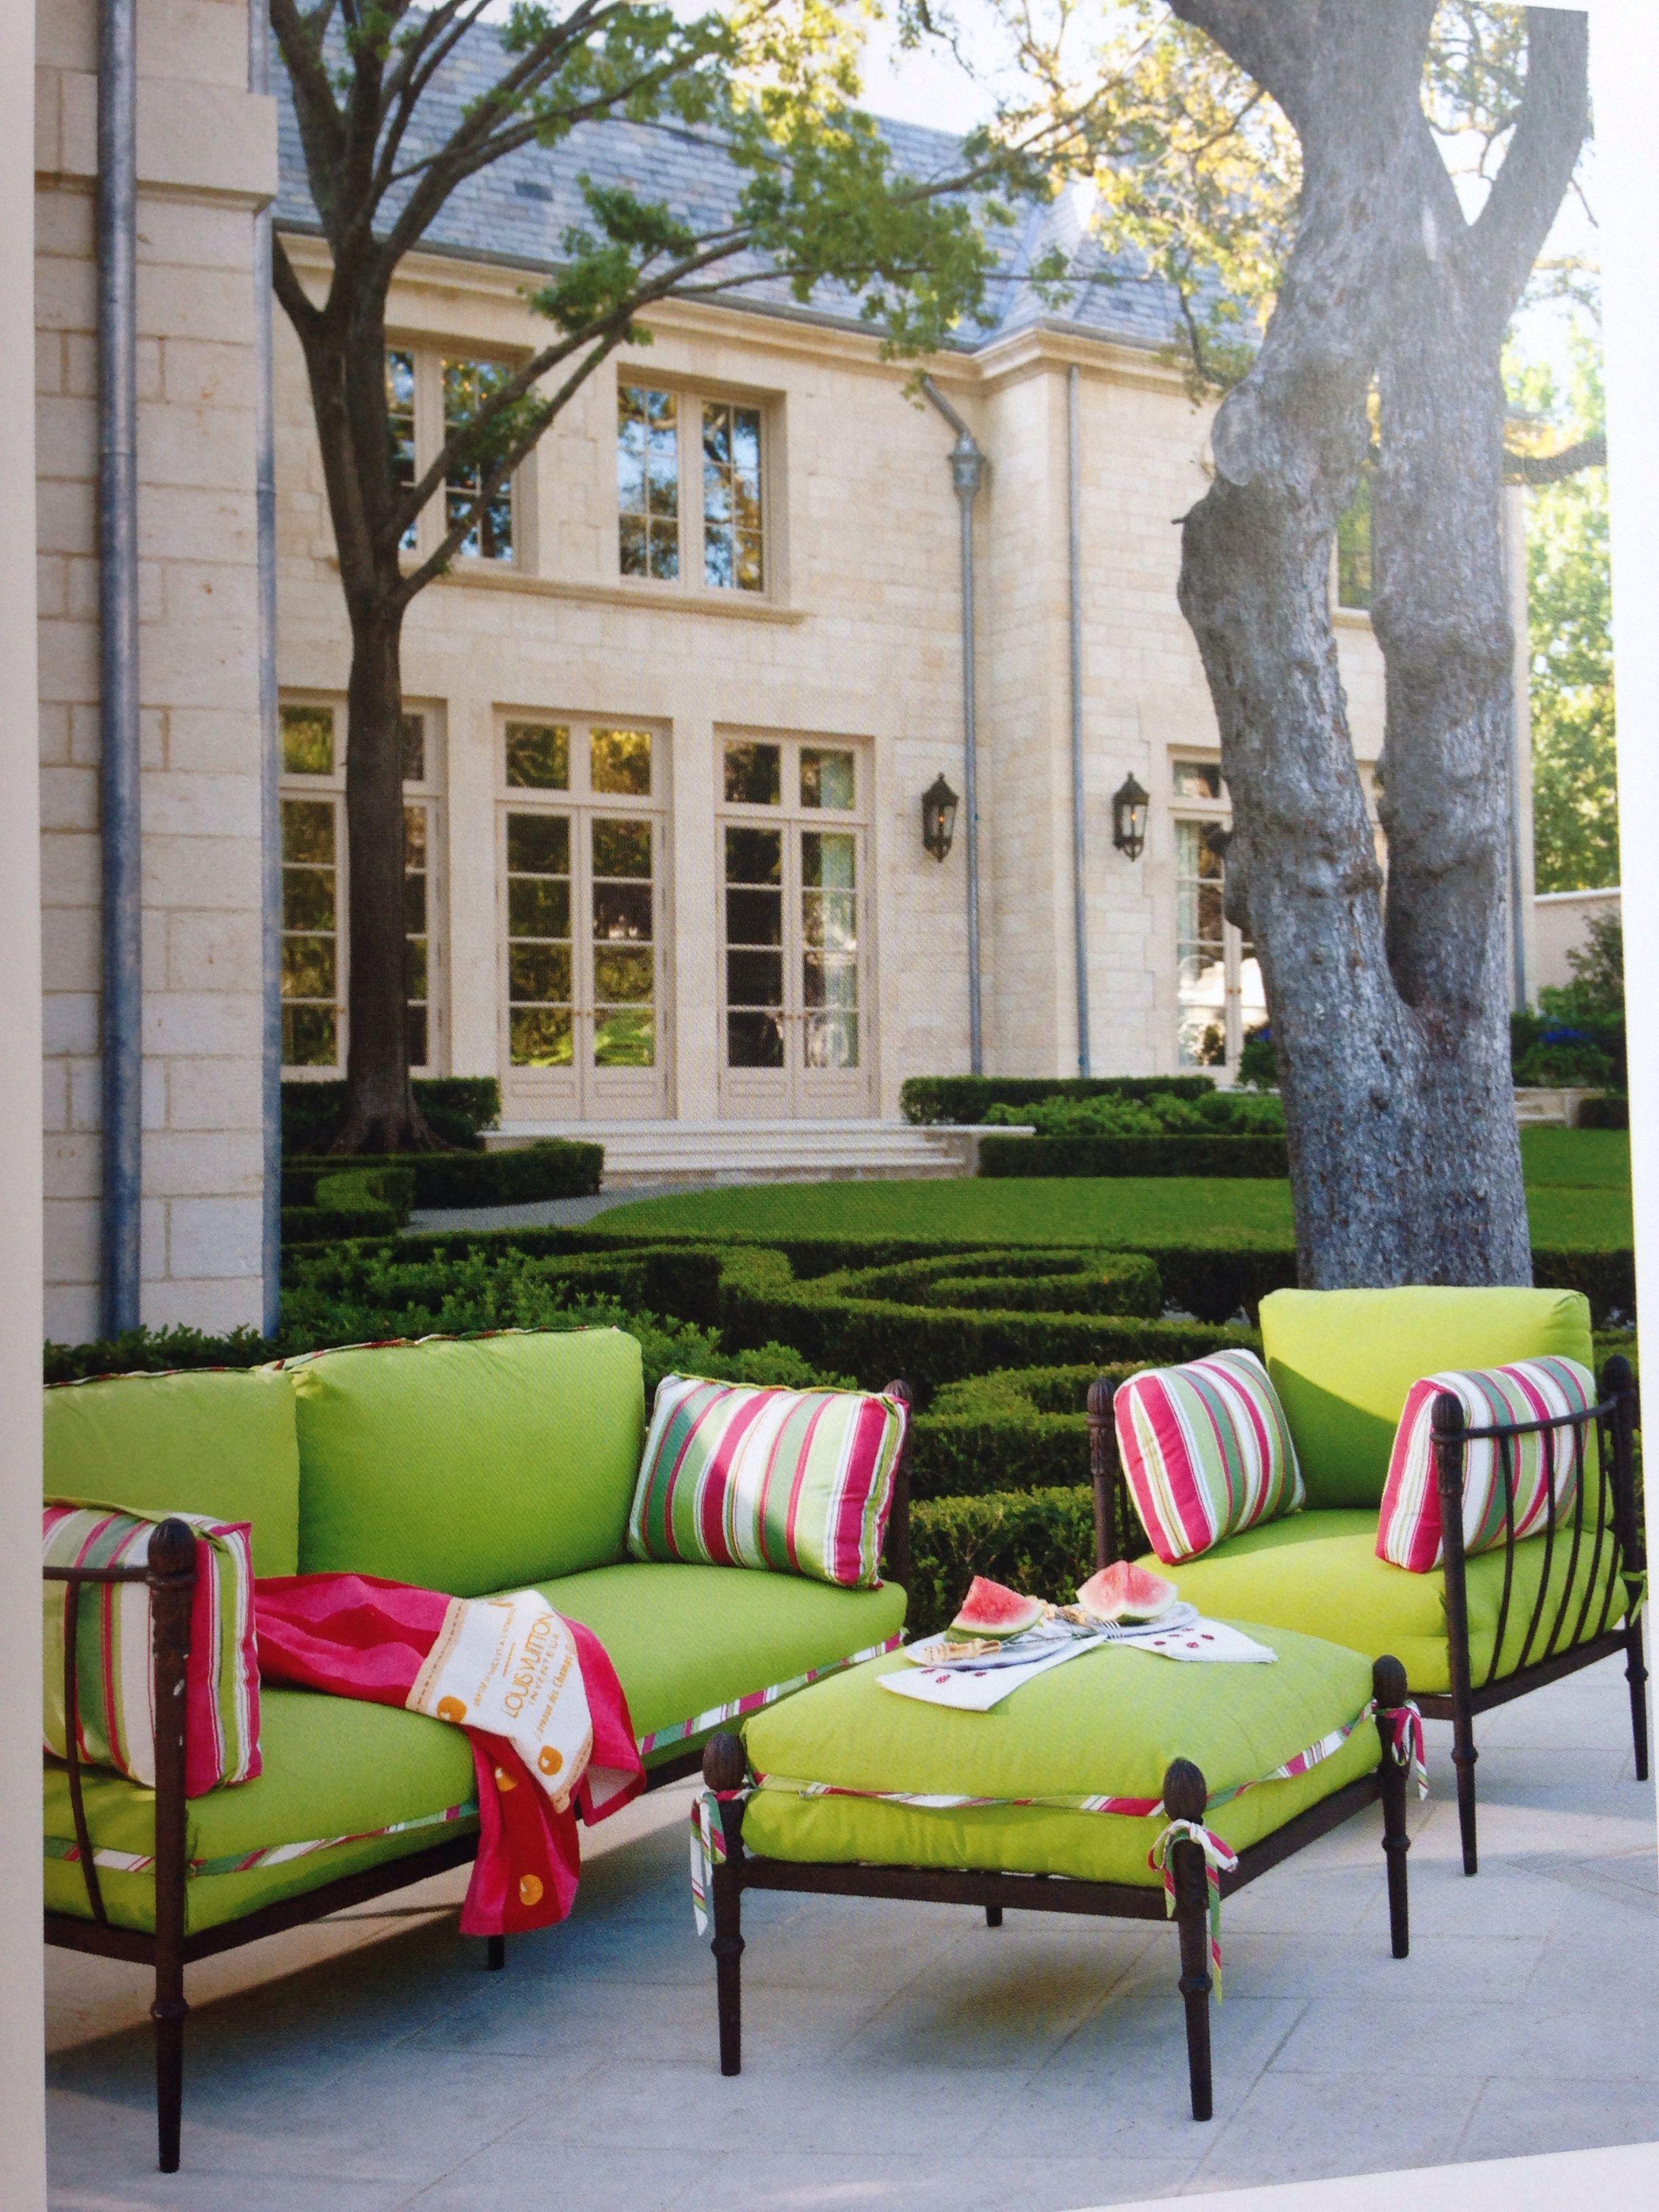 Outdoor Sofa, Outdoor Sectional, Outdoor